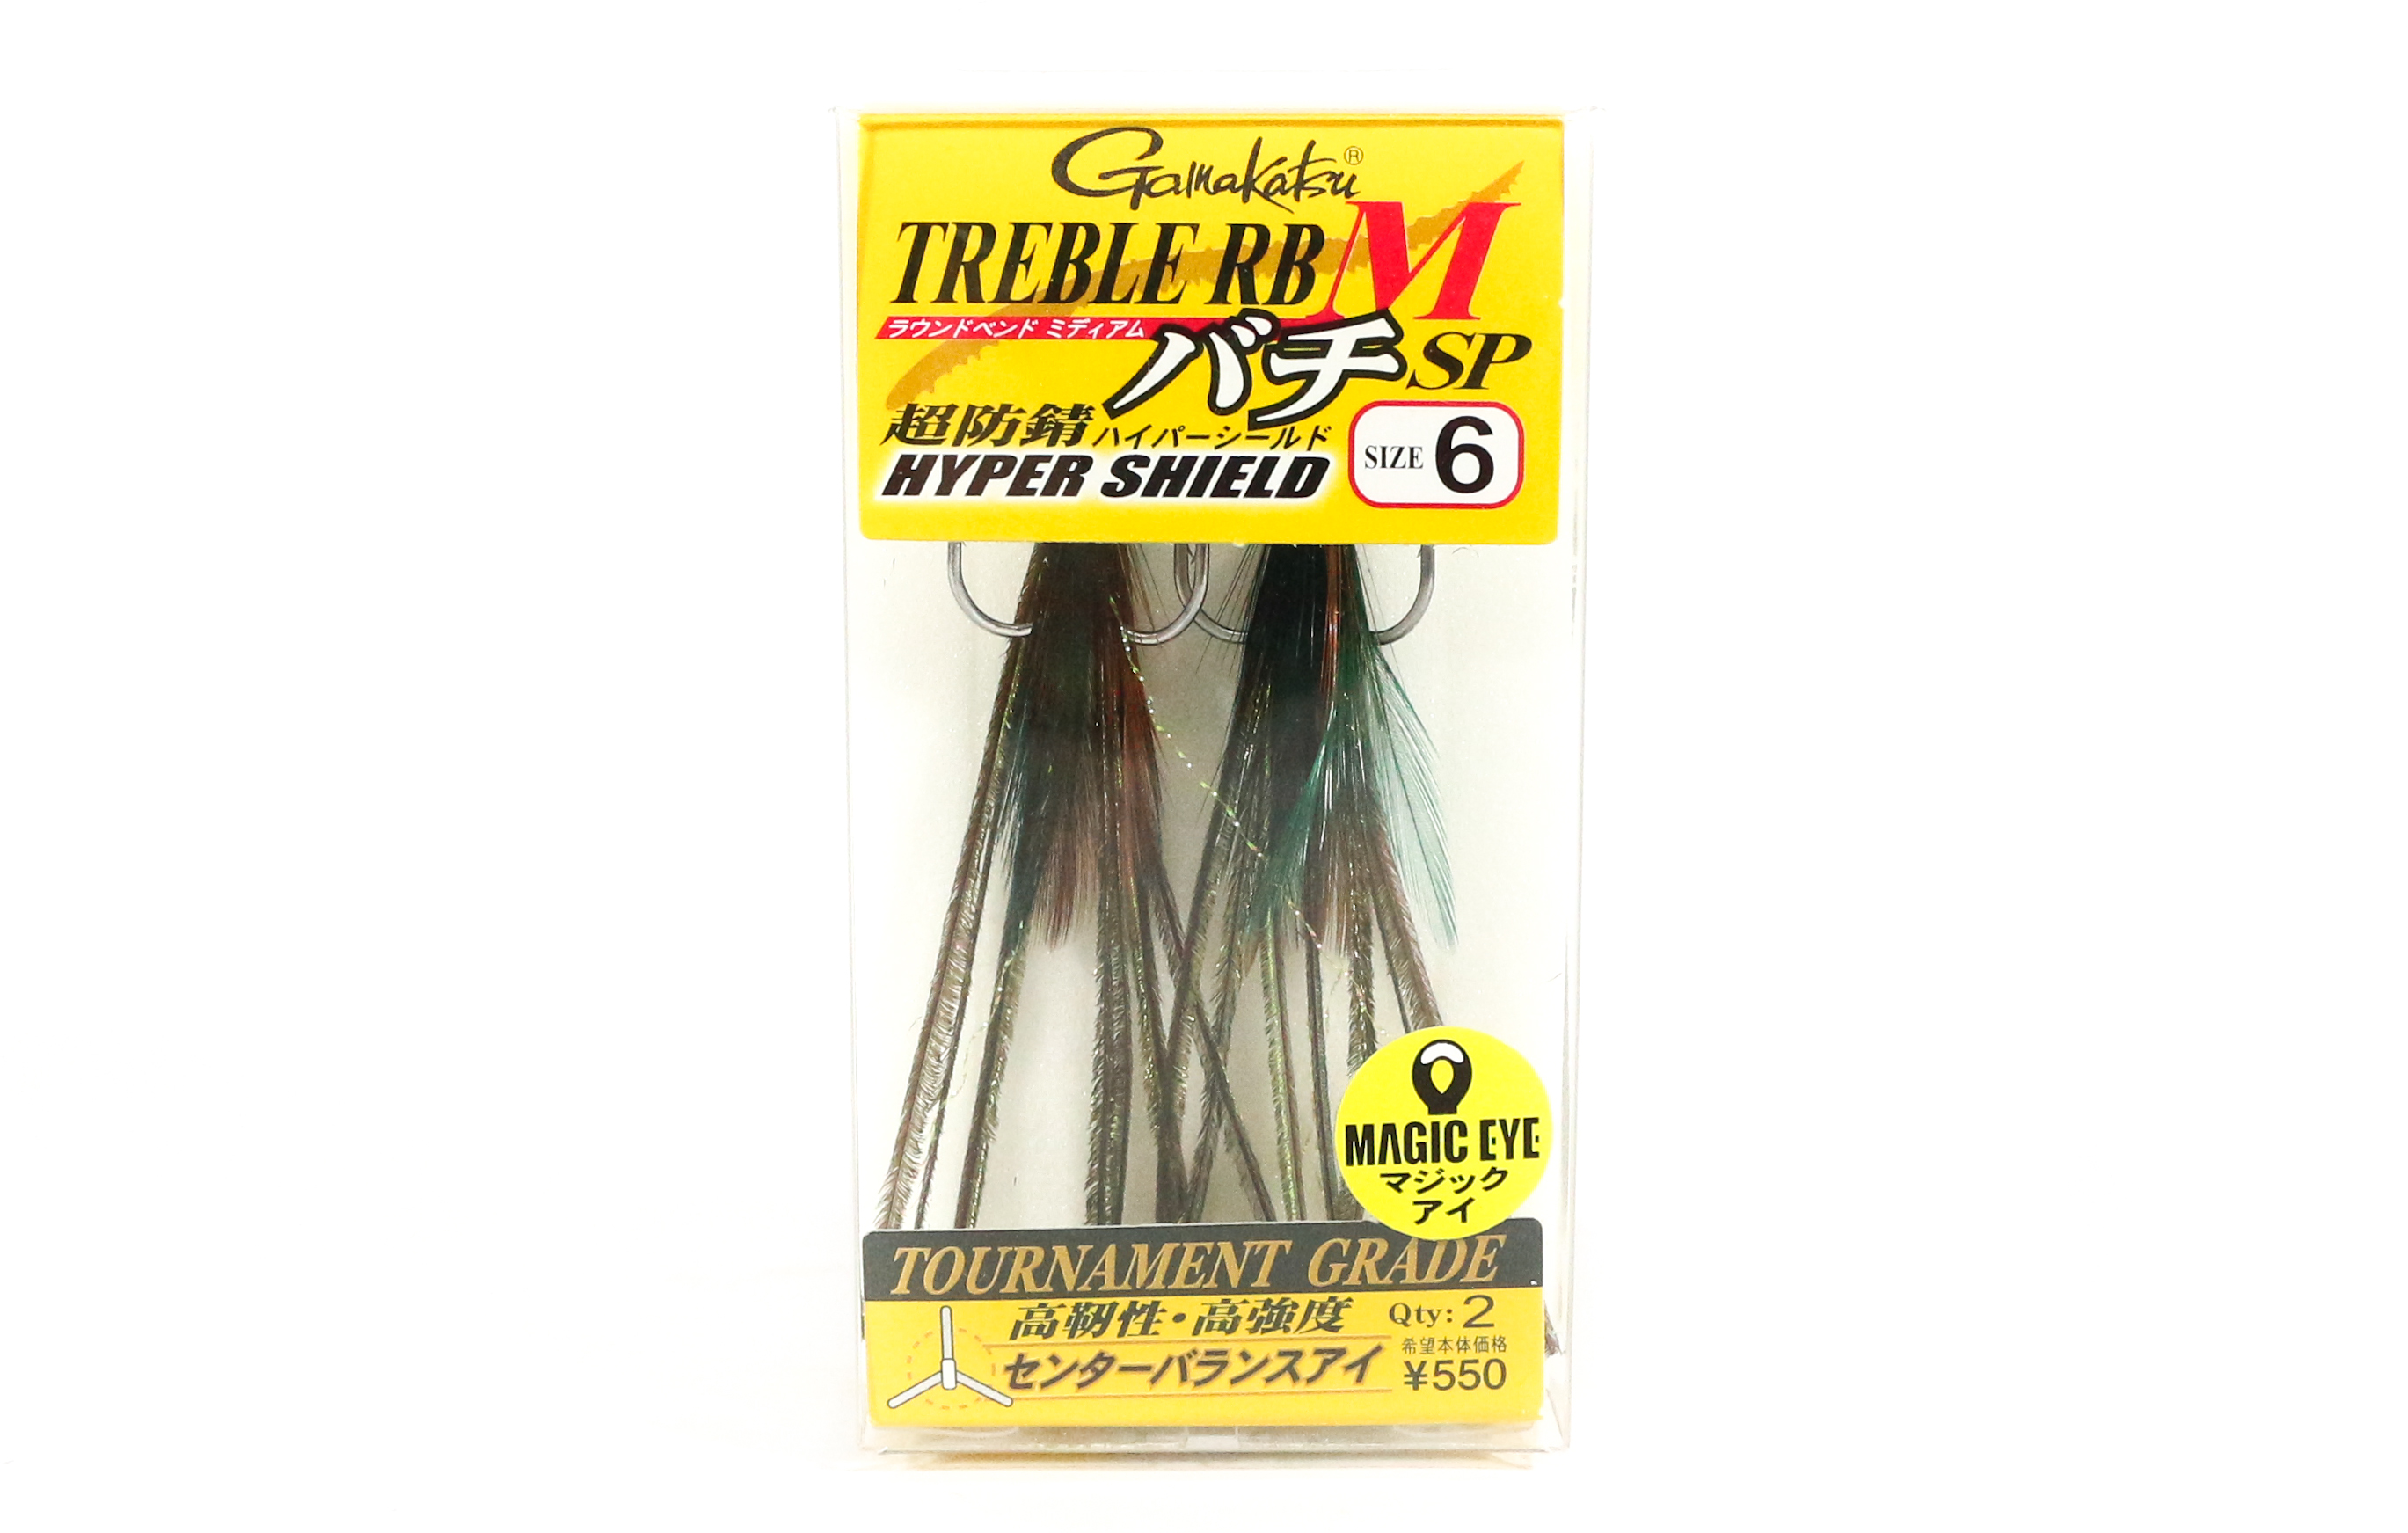 Gamakatsu Treble Hook RB M SP Feather Type Hyper Shield Size 6 (3868)